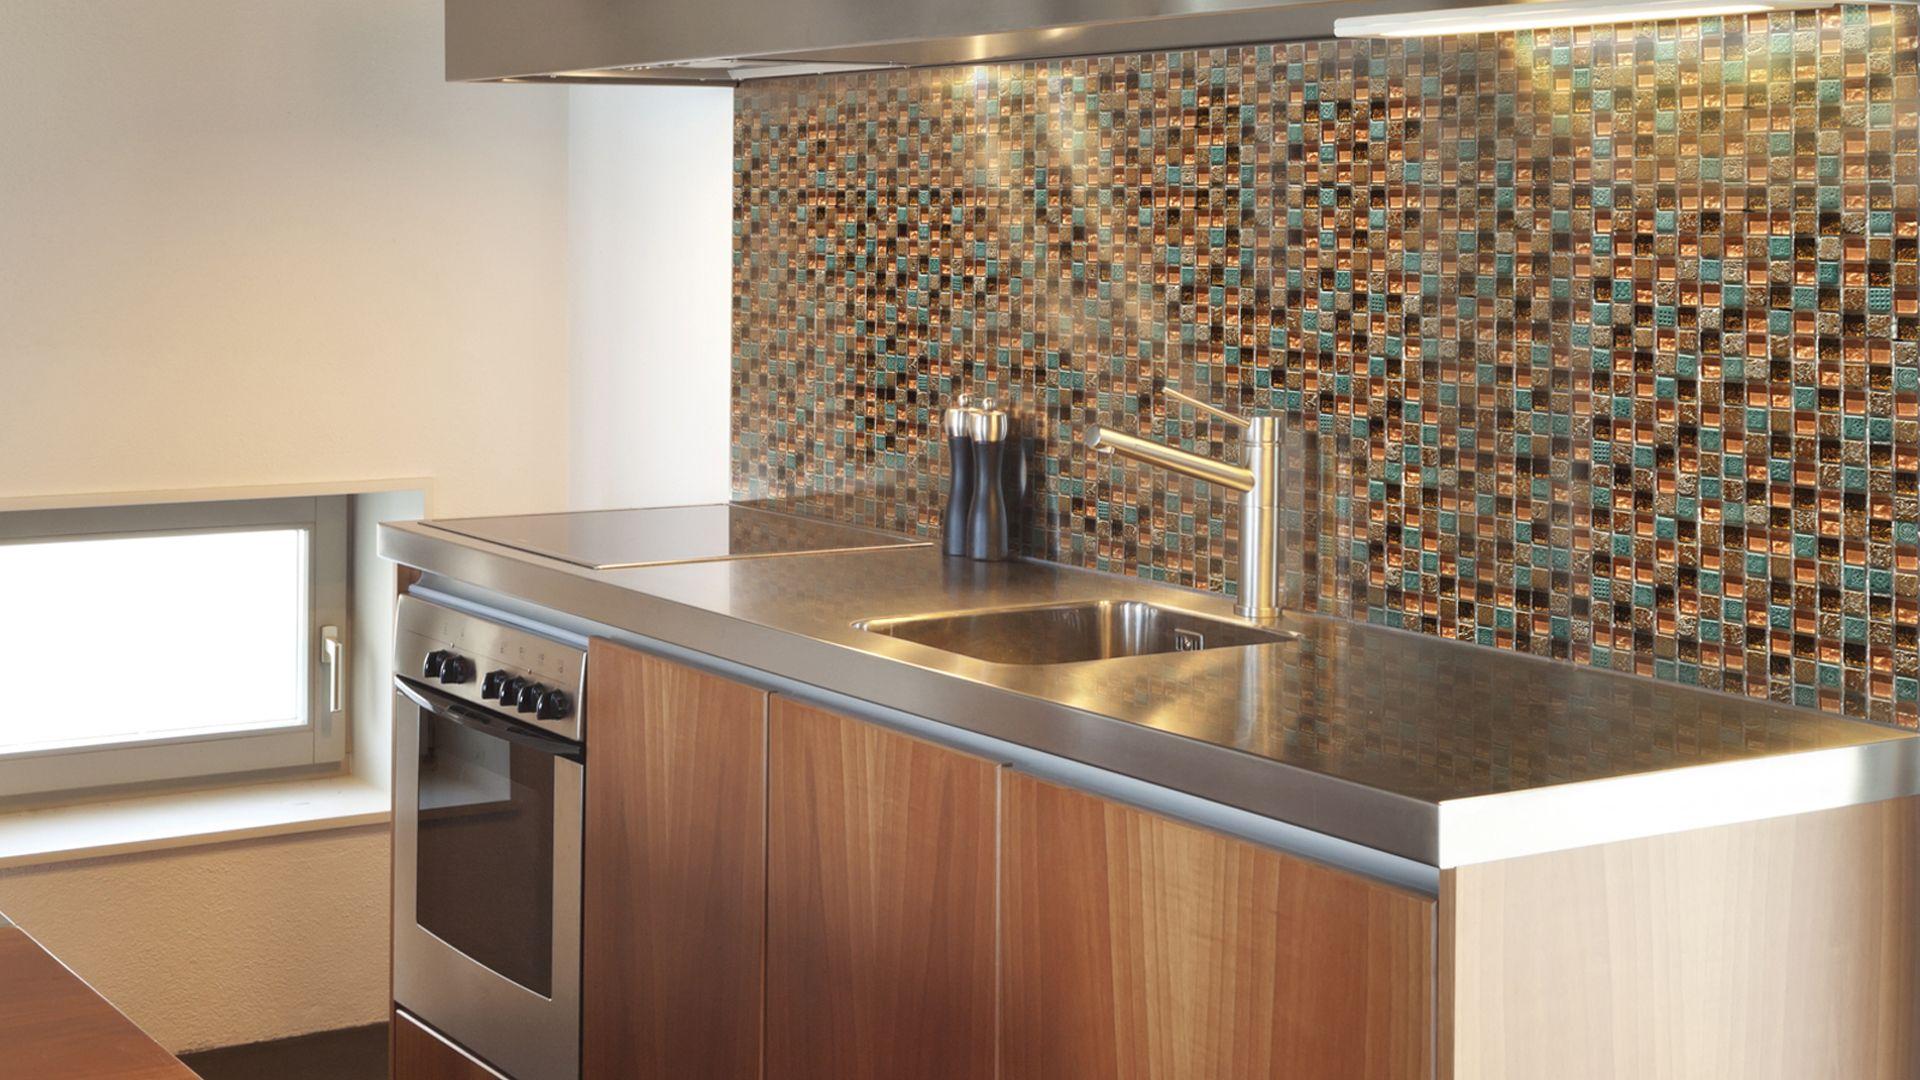 Flare mosaic copper 58x58 sparkle glass mix